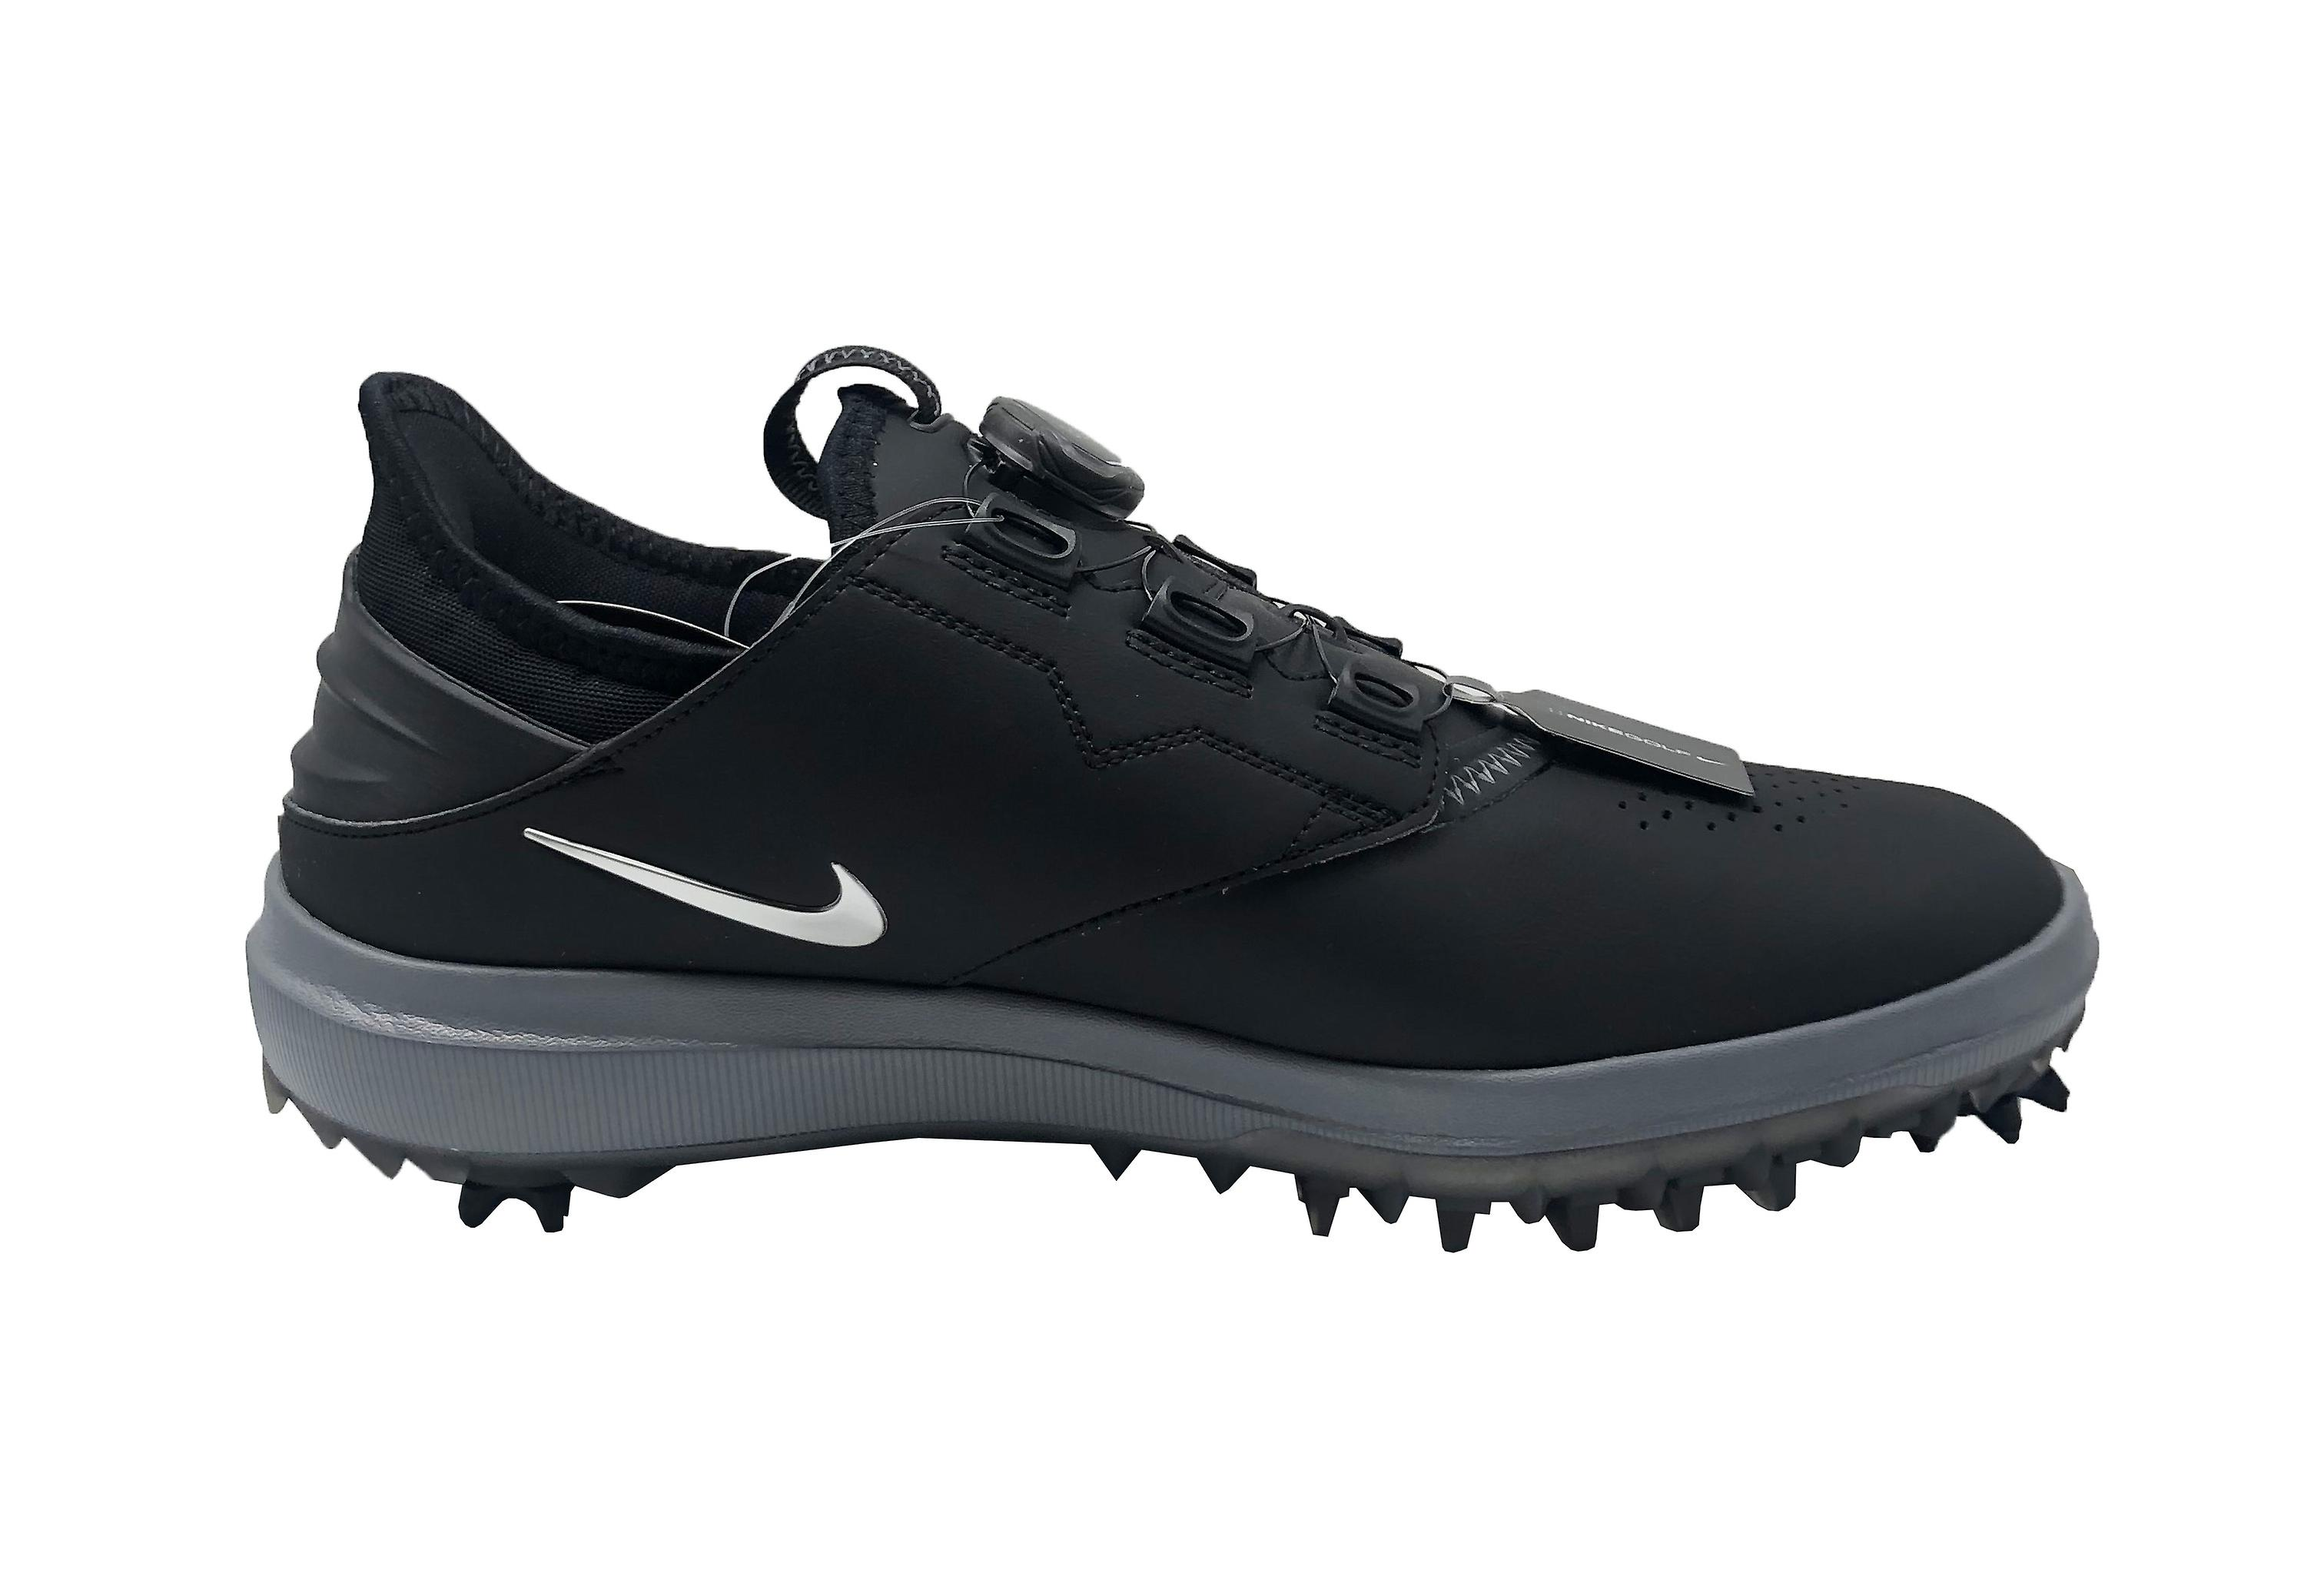 Nike Air Zoom Direct BOA AH7103 001 Mens Golf Shoes